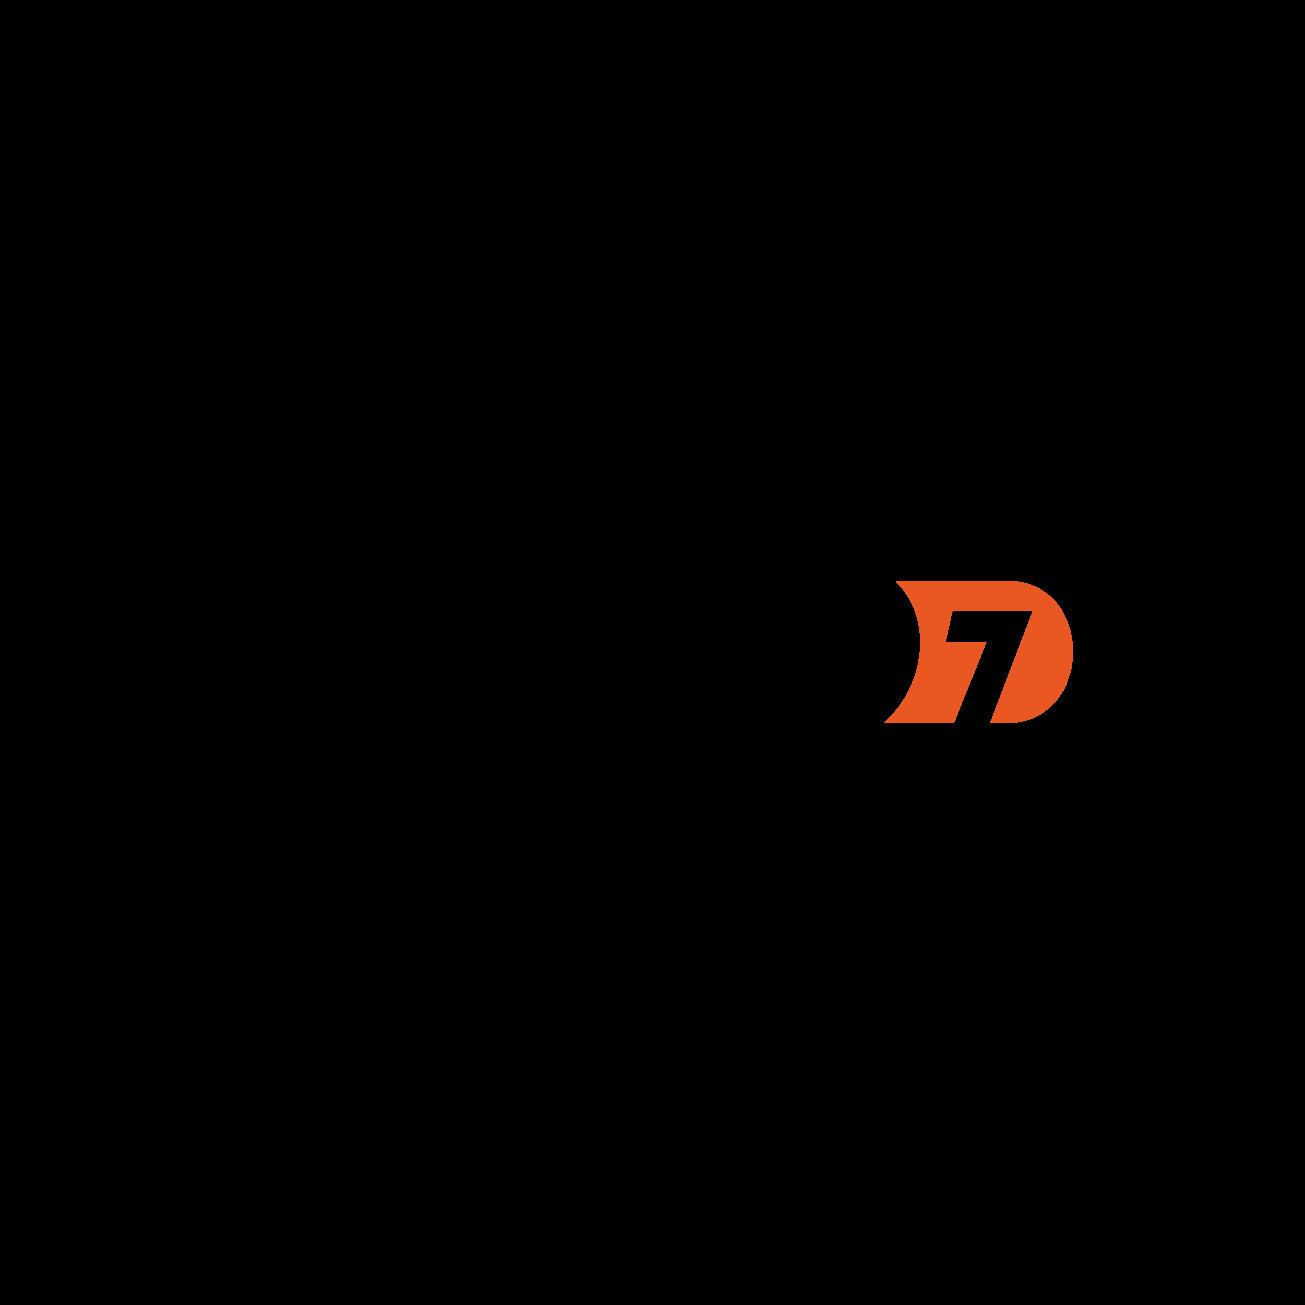 Rapid7 Aktienanalyse | Bilanzanalyse - Fundamentale Aktienanalyse